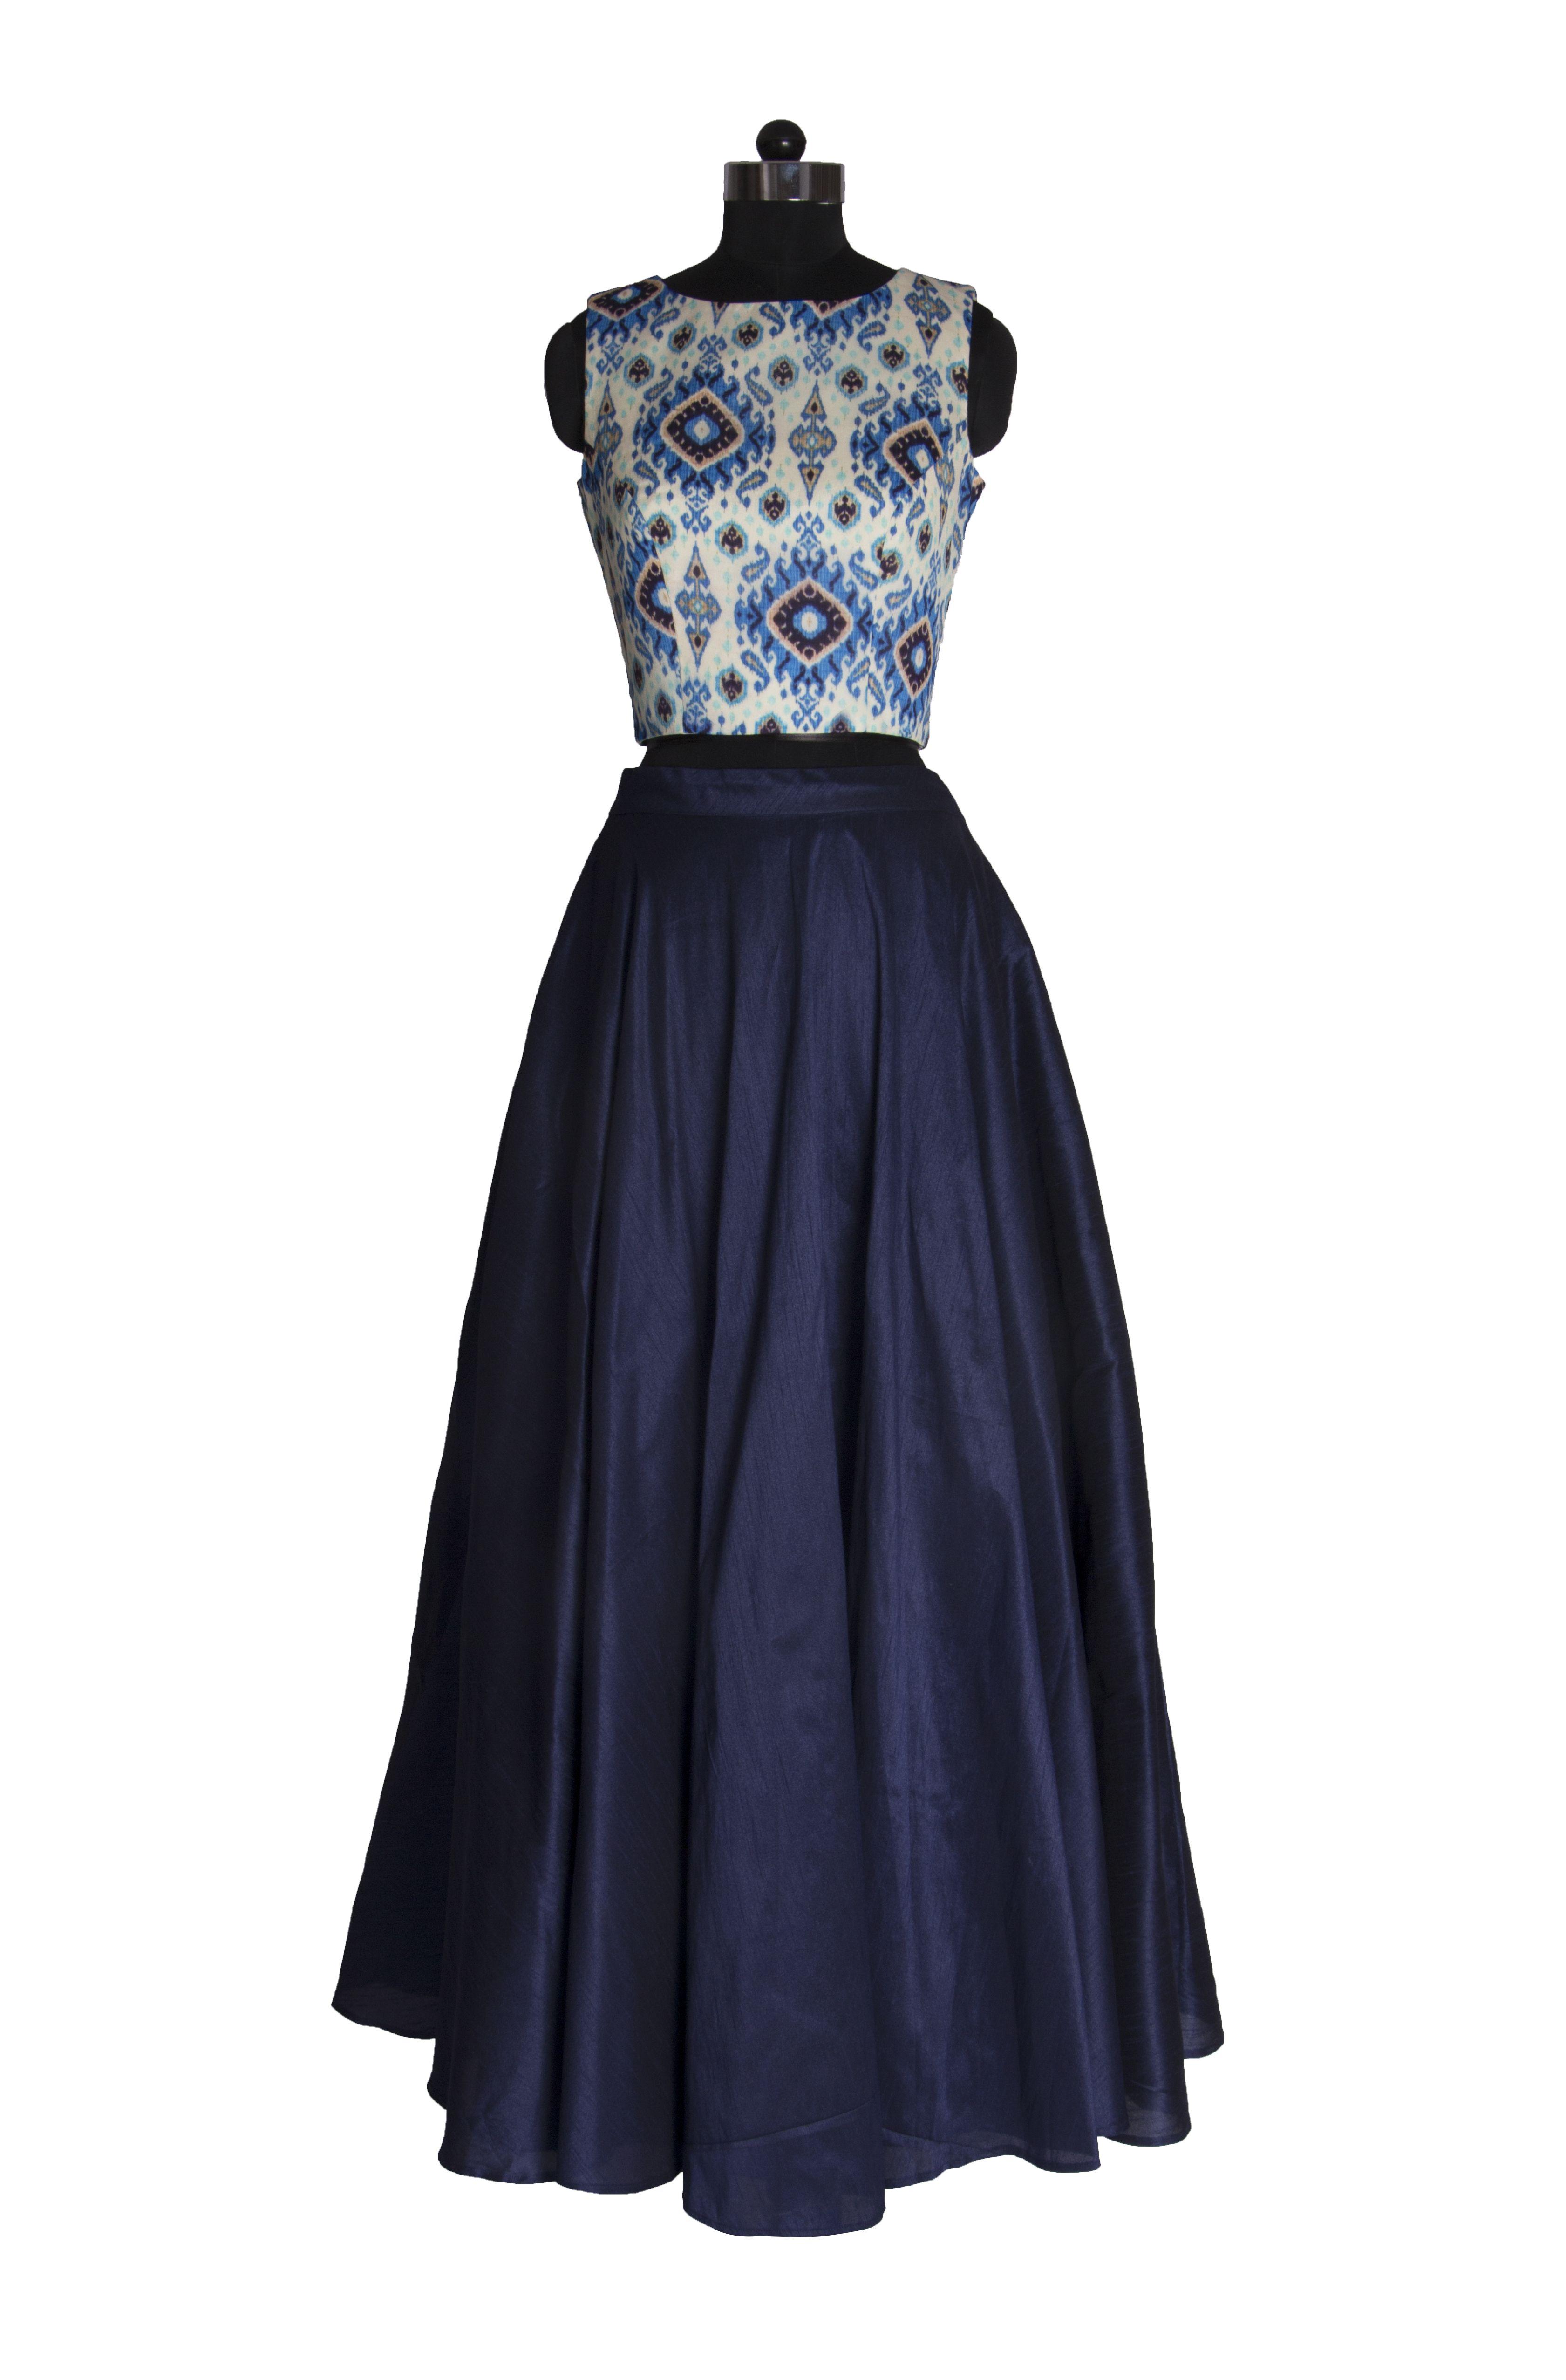 b3a58715a Navy blue skirt in a paisley print crop top lehenga set | Indian ...